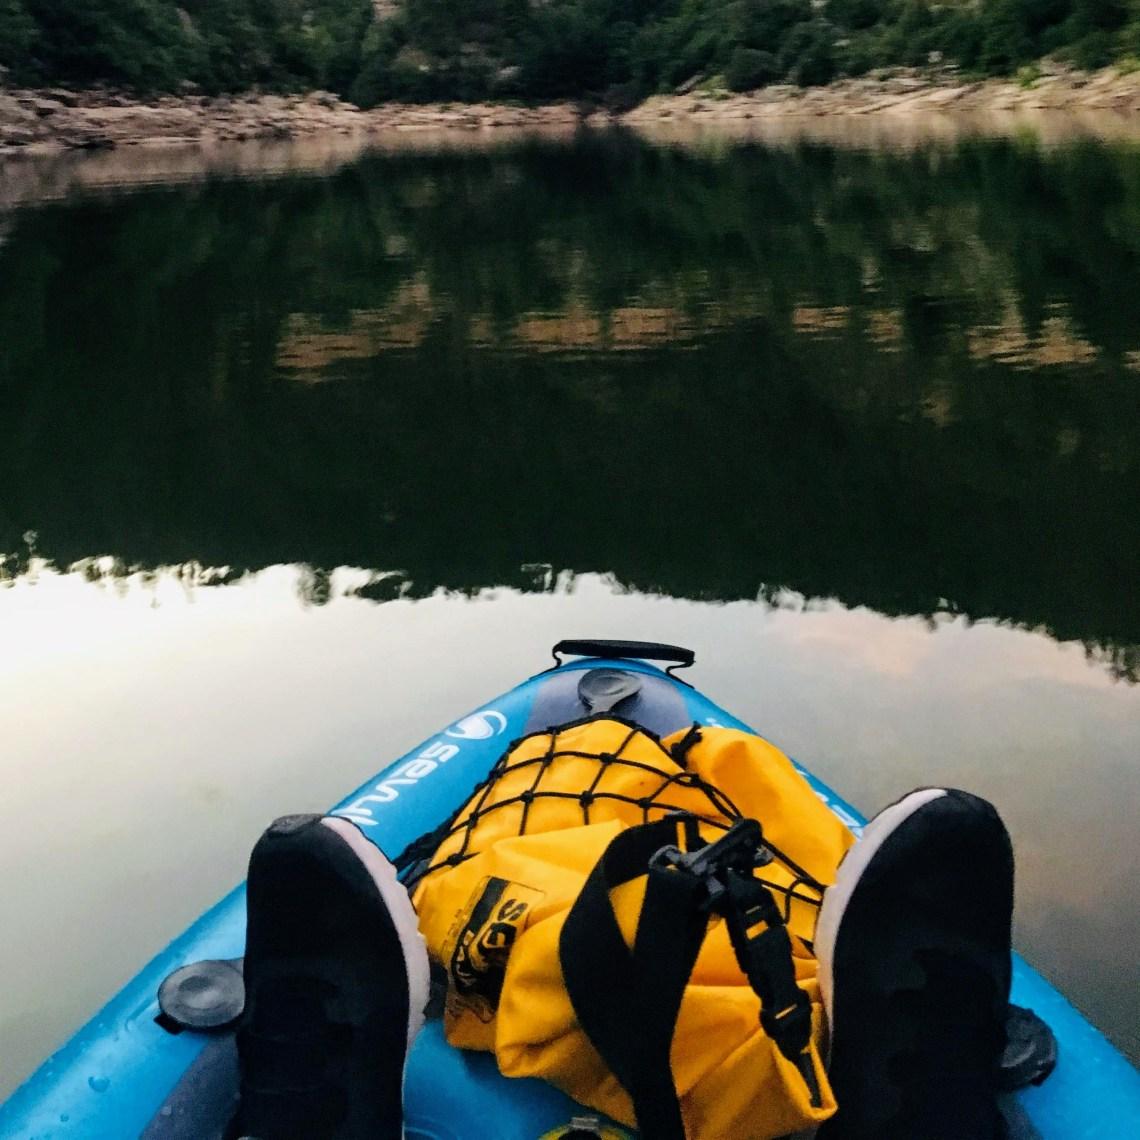 Glassy waters of Blue Ridge Reservoir